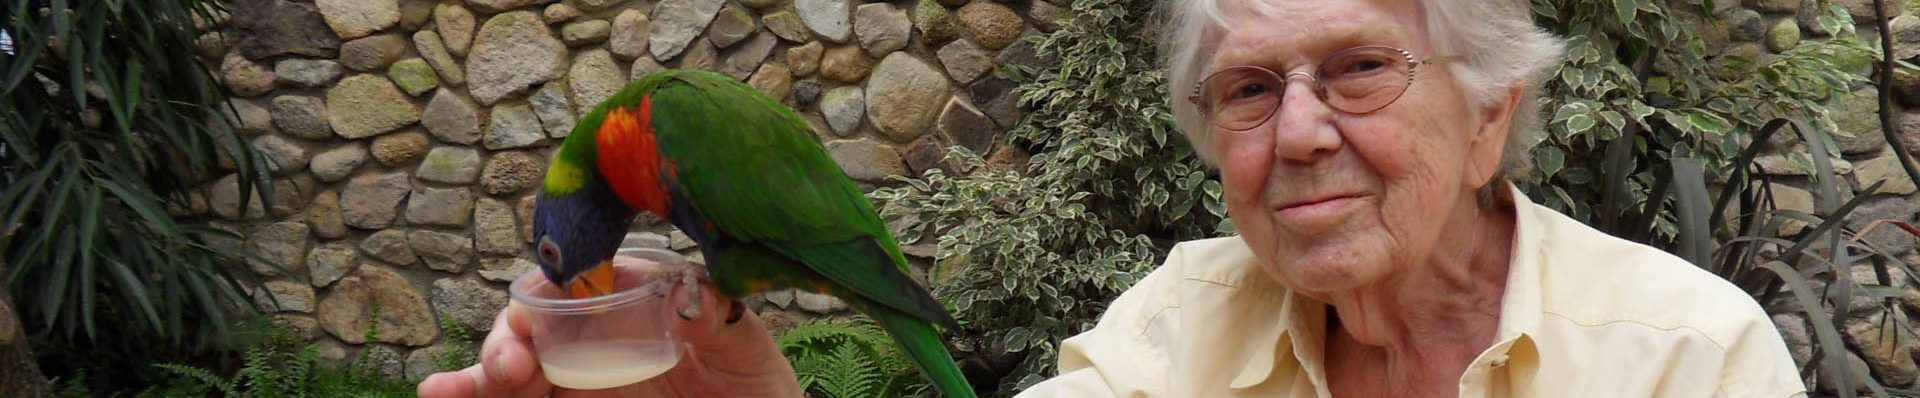 Category: Weltvogelpark